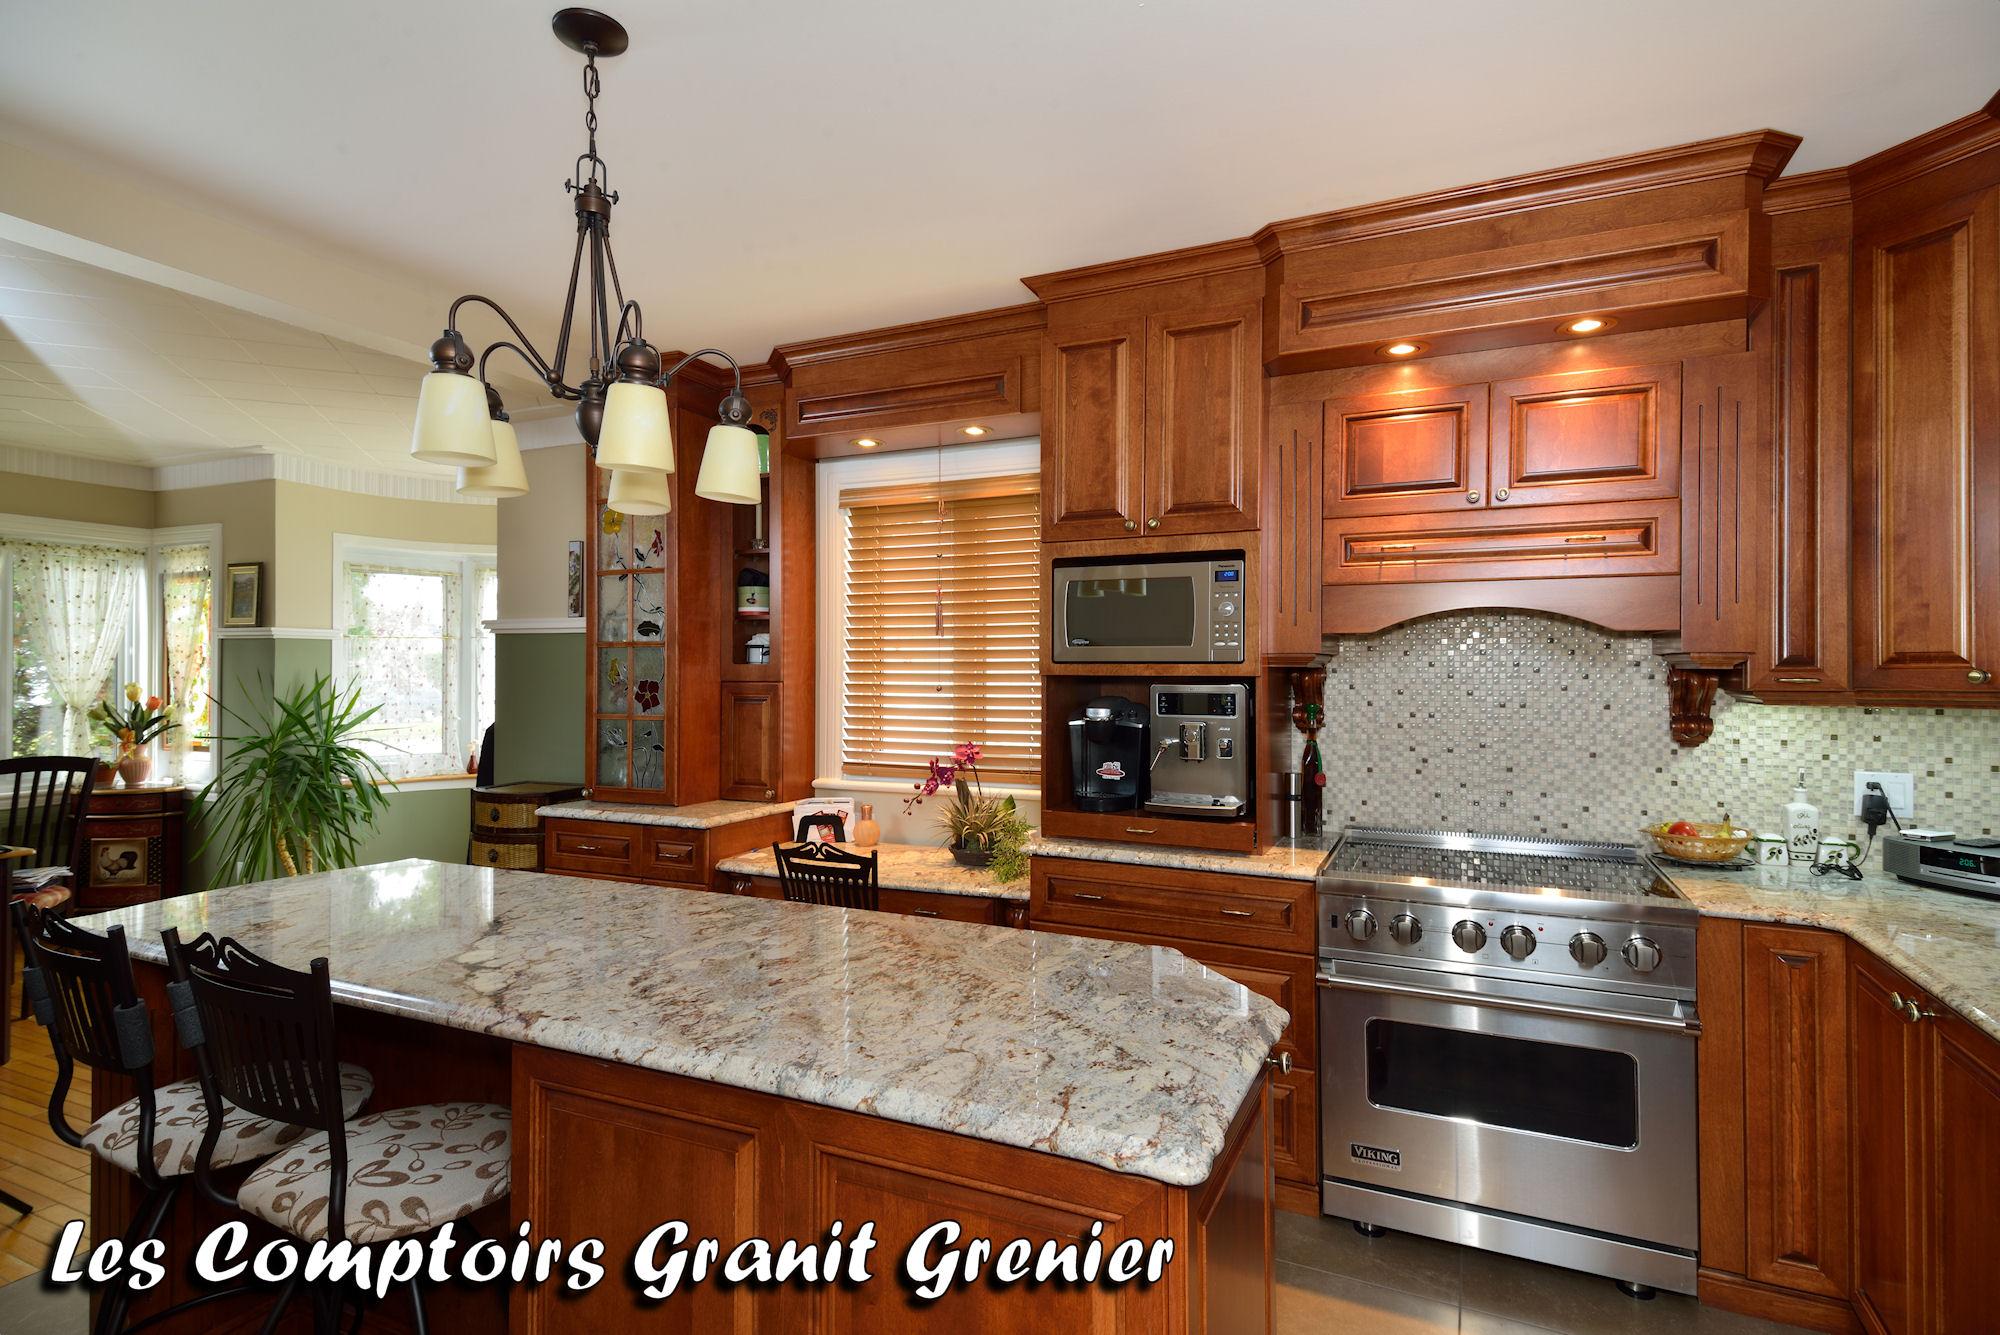 Comptoir De Granit Et Quartz Realisations De Cuisines Et Vanites